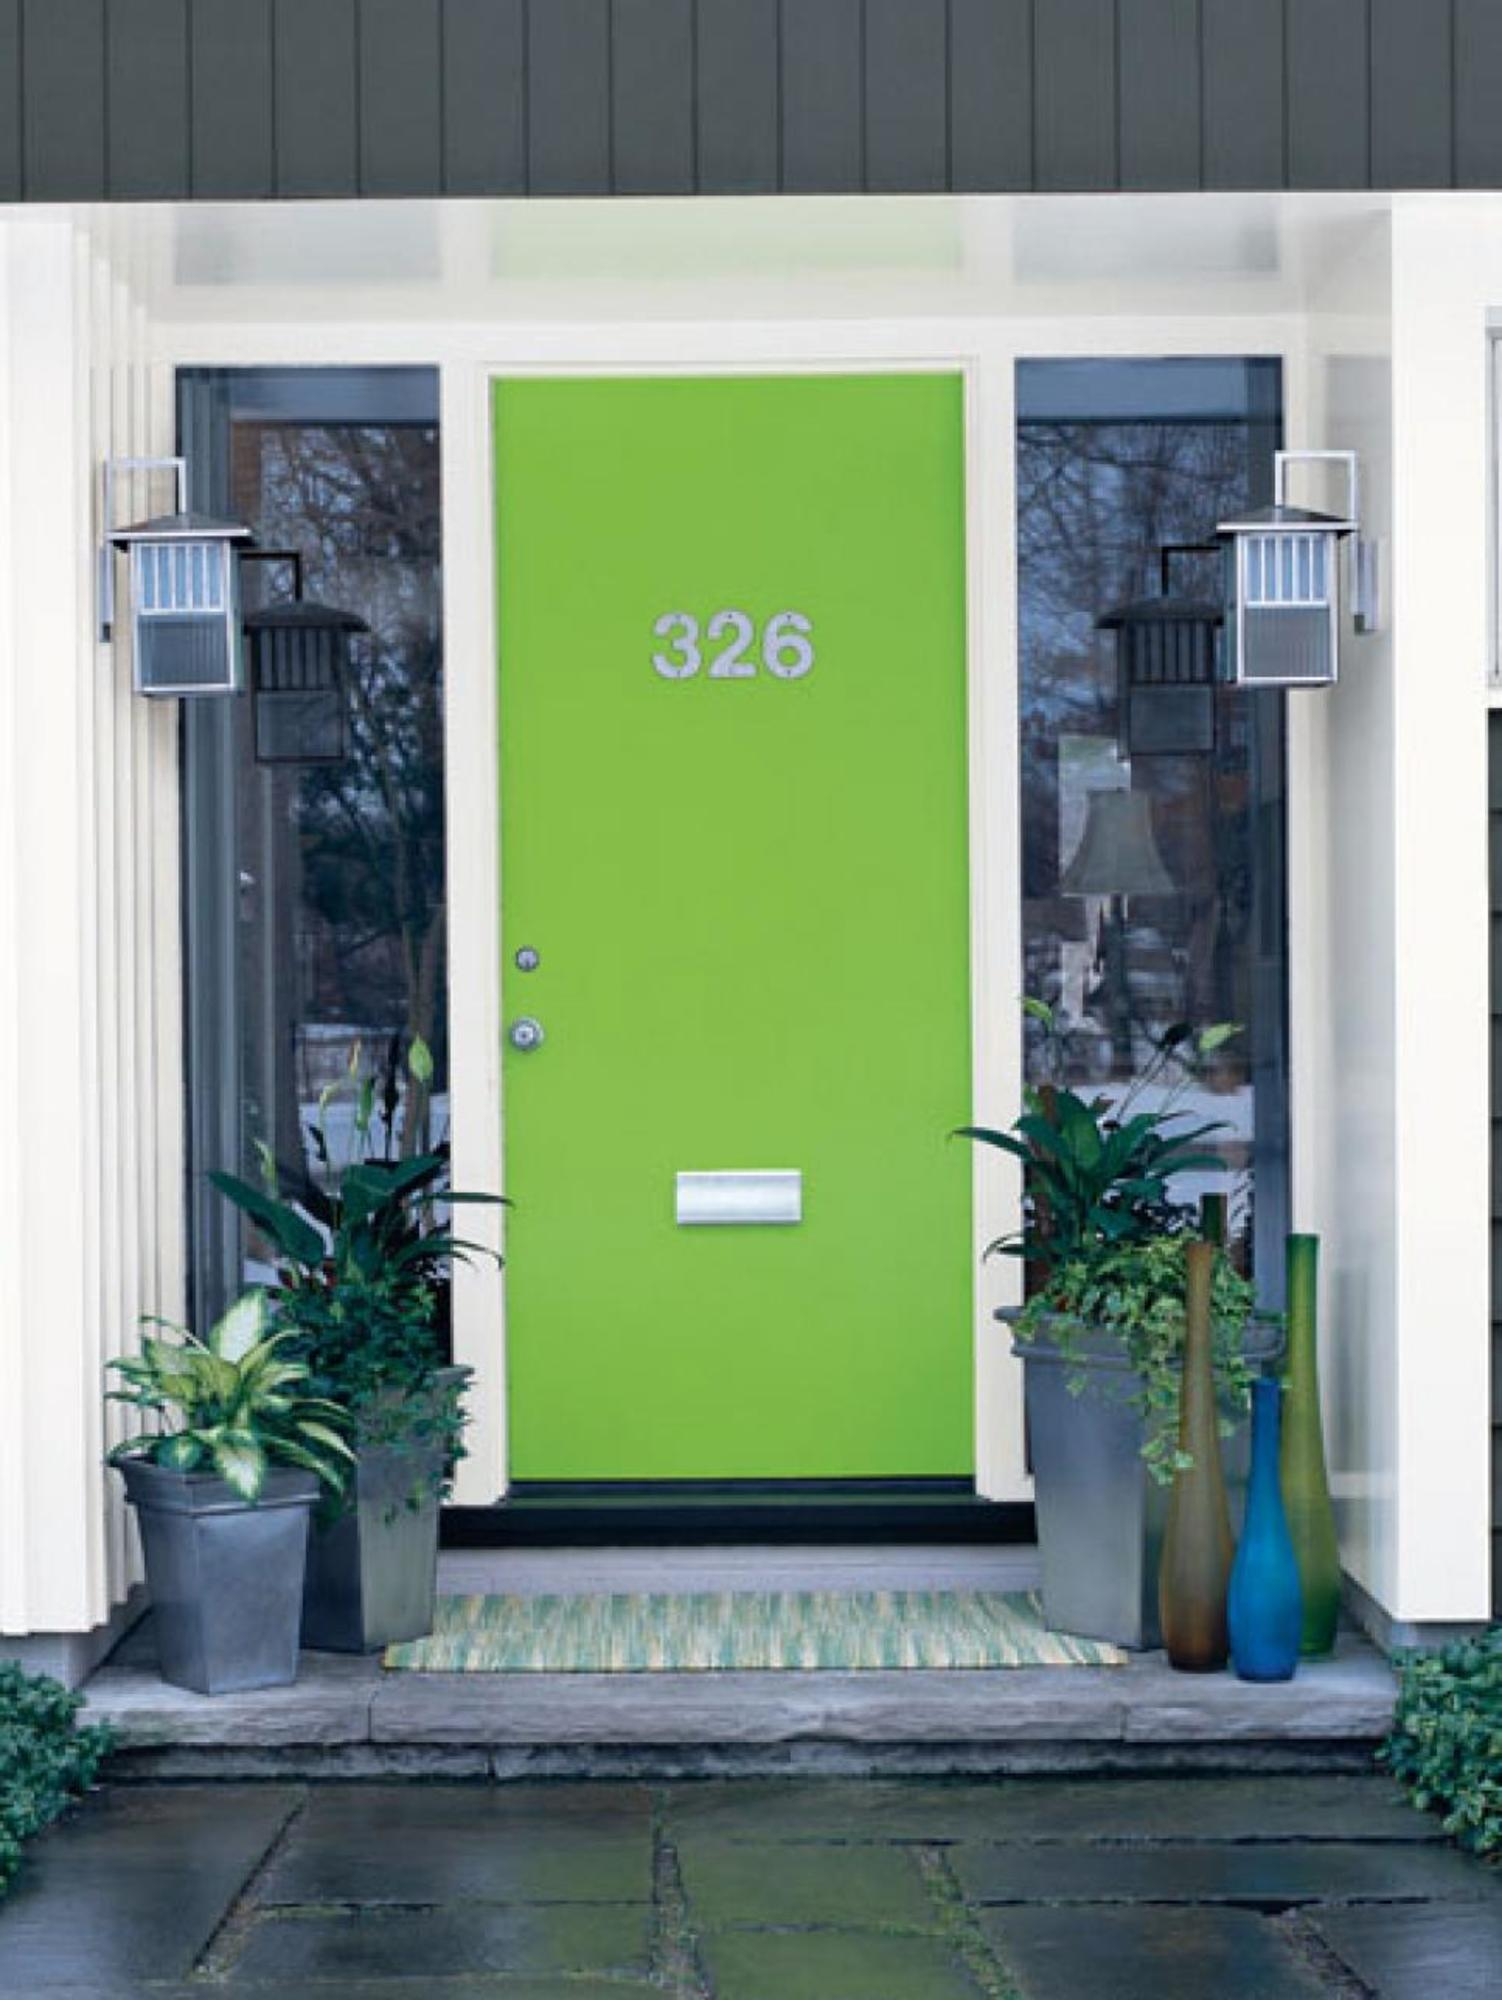 CI-Sherwin-Williams_Bright-Green-Front-Door_s3x4.jpg.rend.hgtvcom.966.1288.jpeg